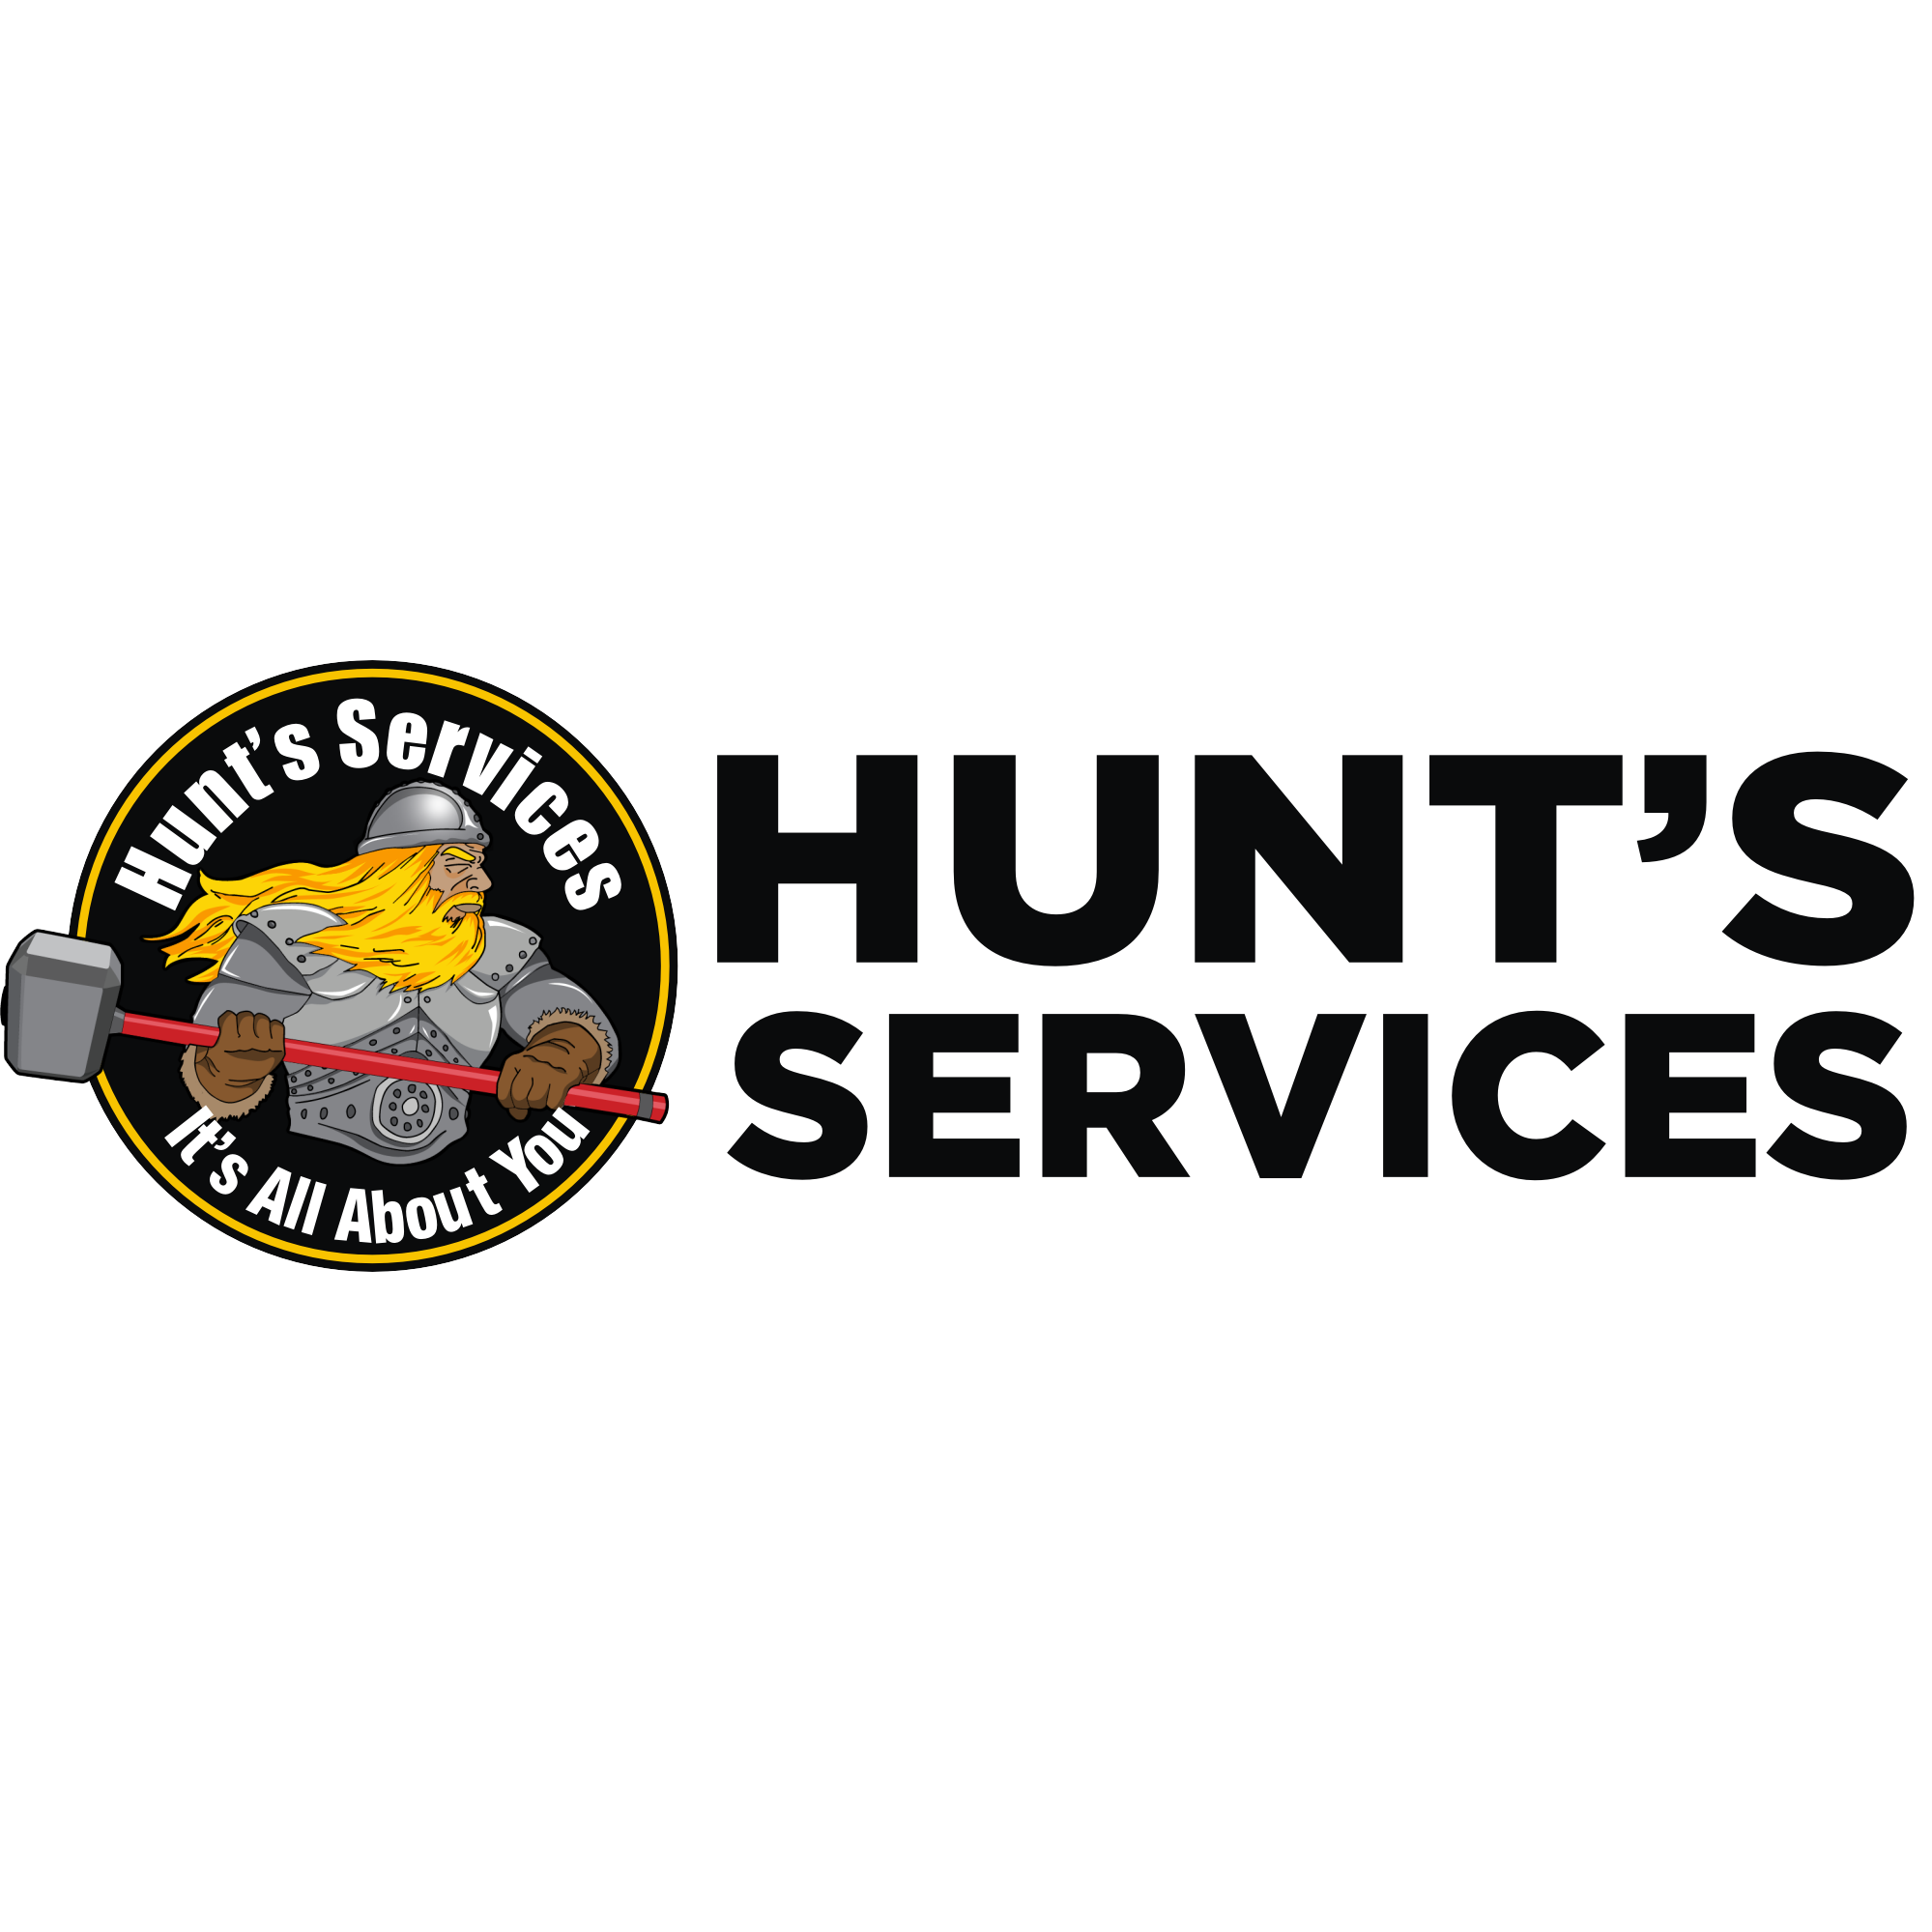 Hunts Services image 1